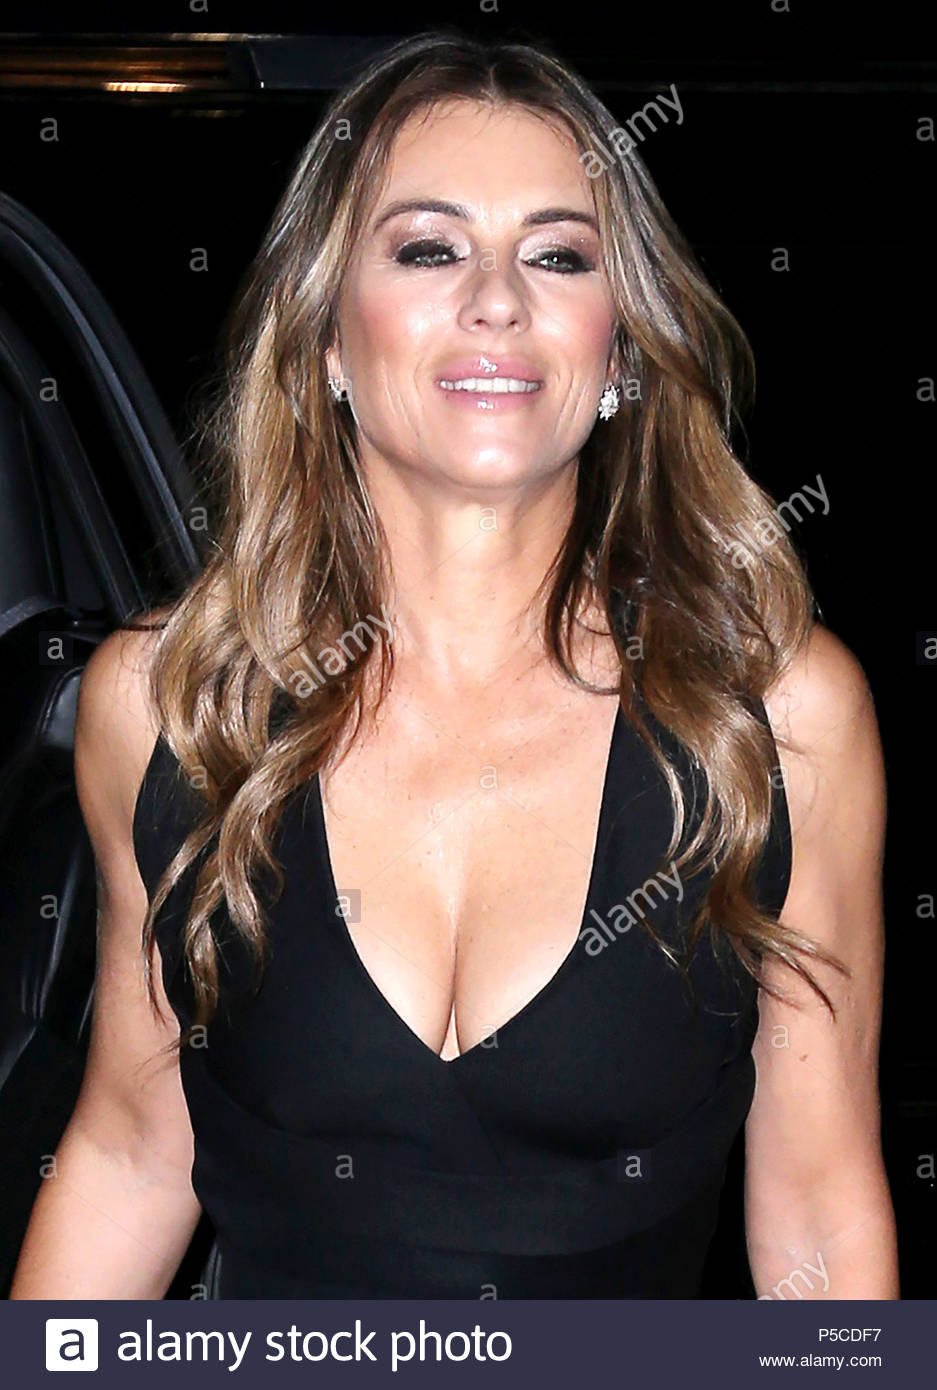 Celebrity Elizabeth Hurley nudes (38 photo), Pussy, Hot, Instagram, bra 2006